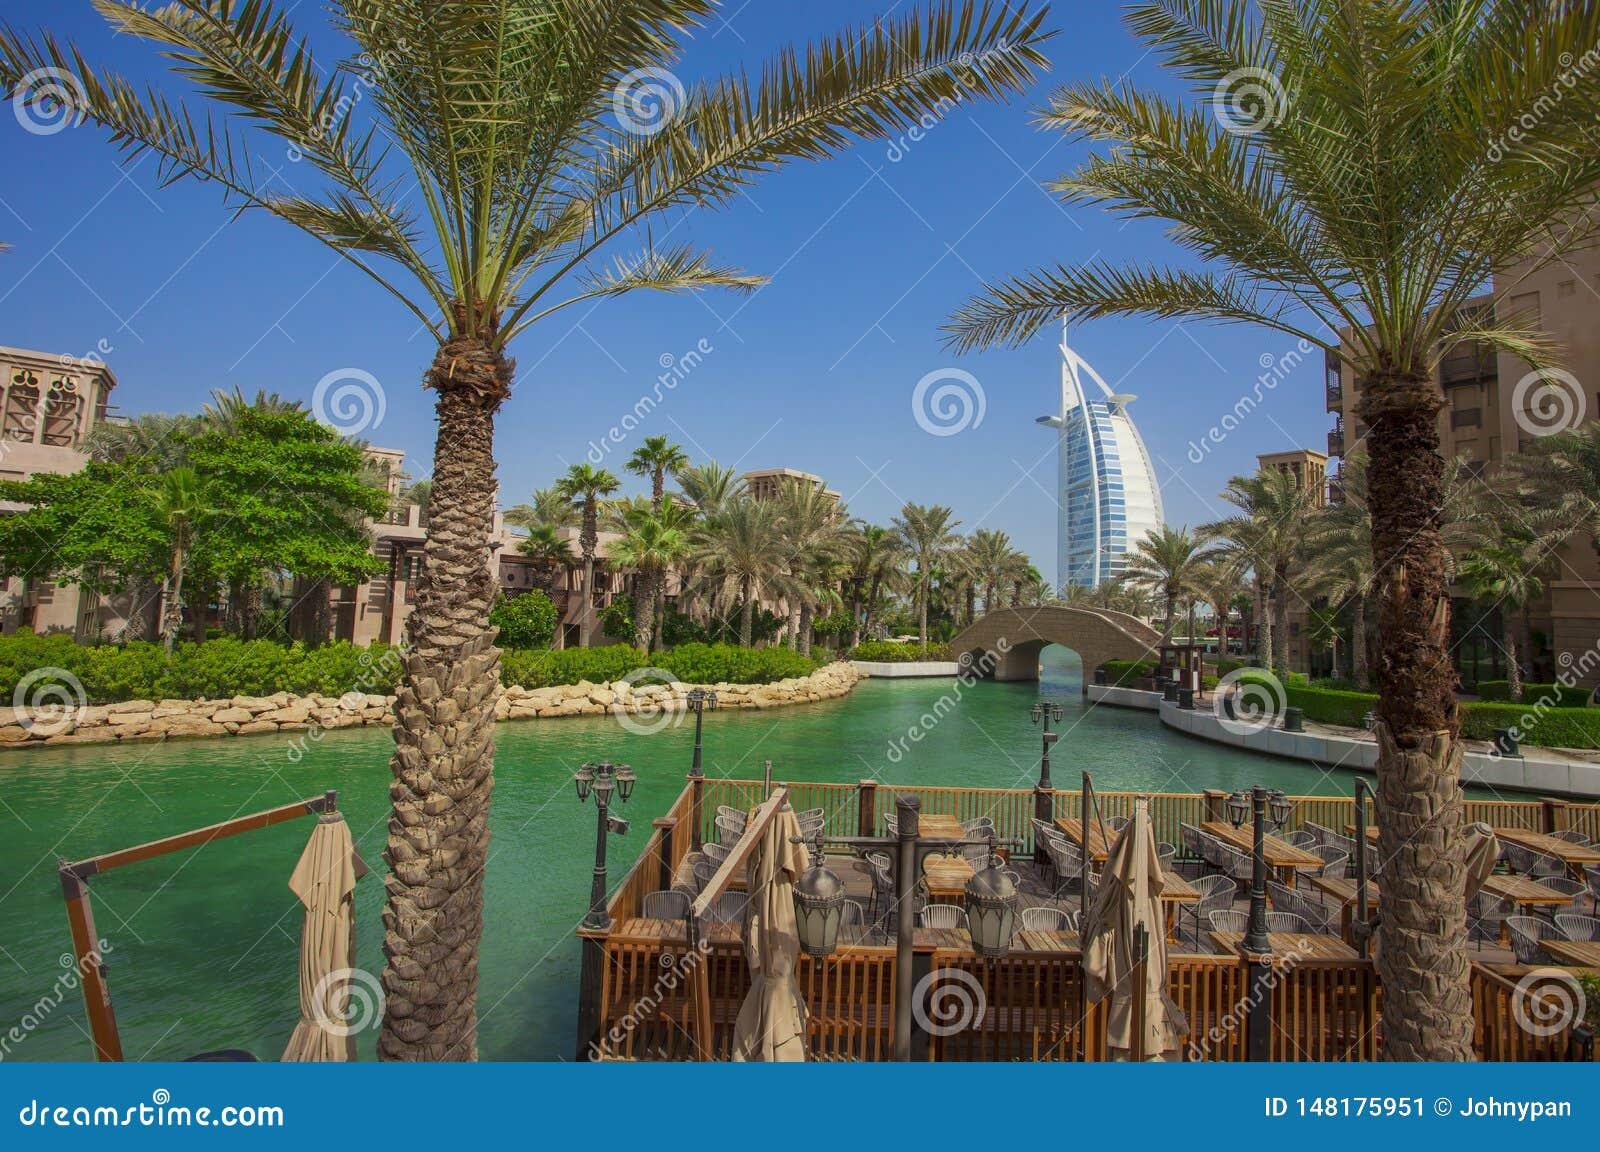 Burj Al Arab Famous Hotel And Palm Trees In The Dubai City Resort Editorial Photo Image Of Arab 2020 148175951